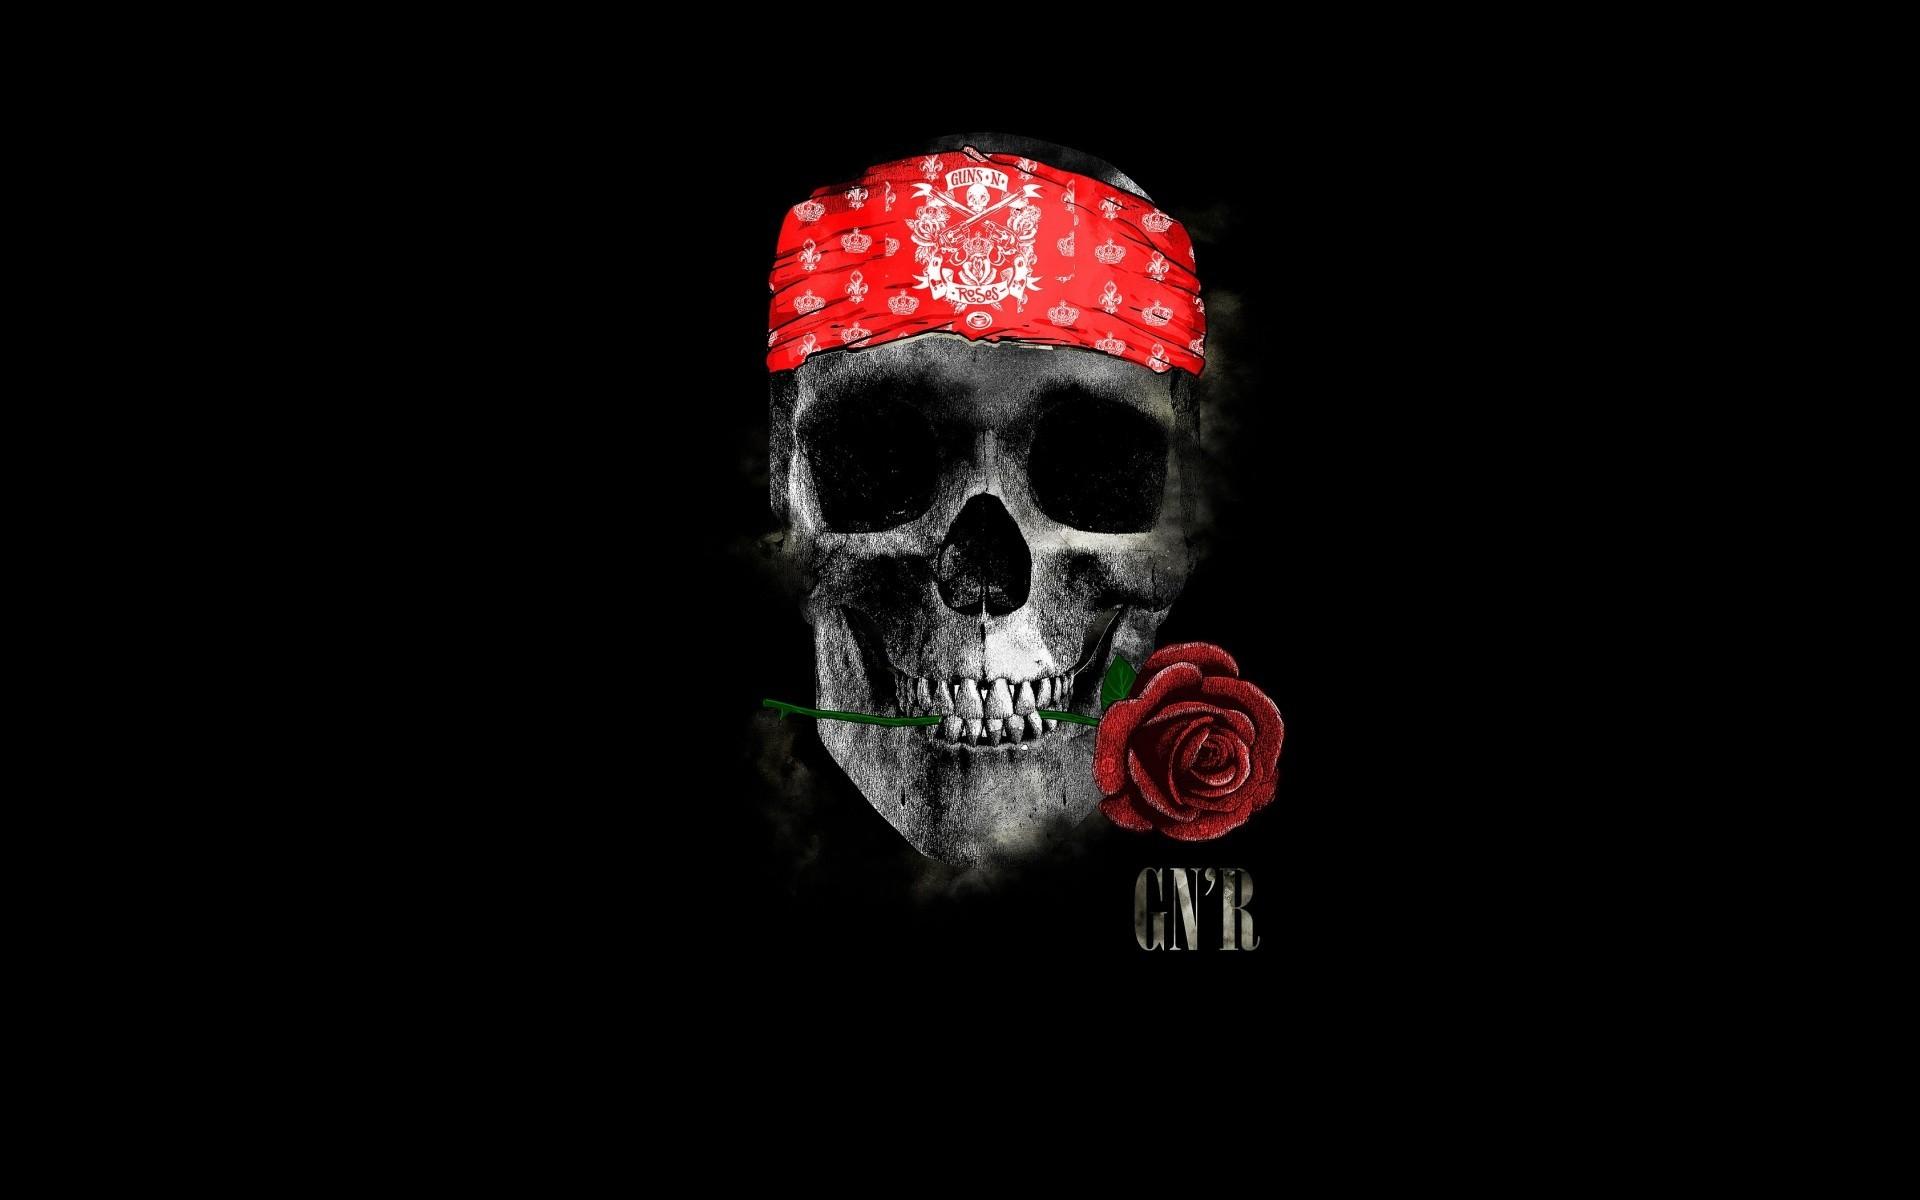 Wallpaper Skull Guns N Roses Rock And Roll Bone